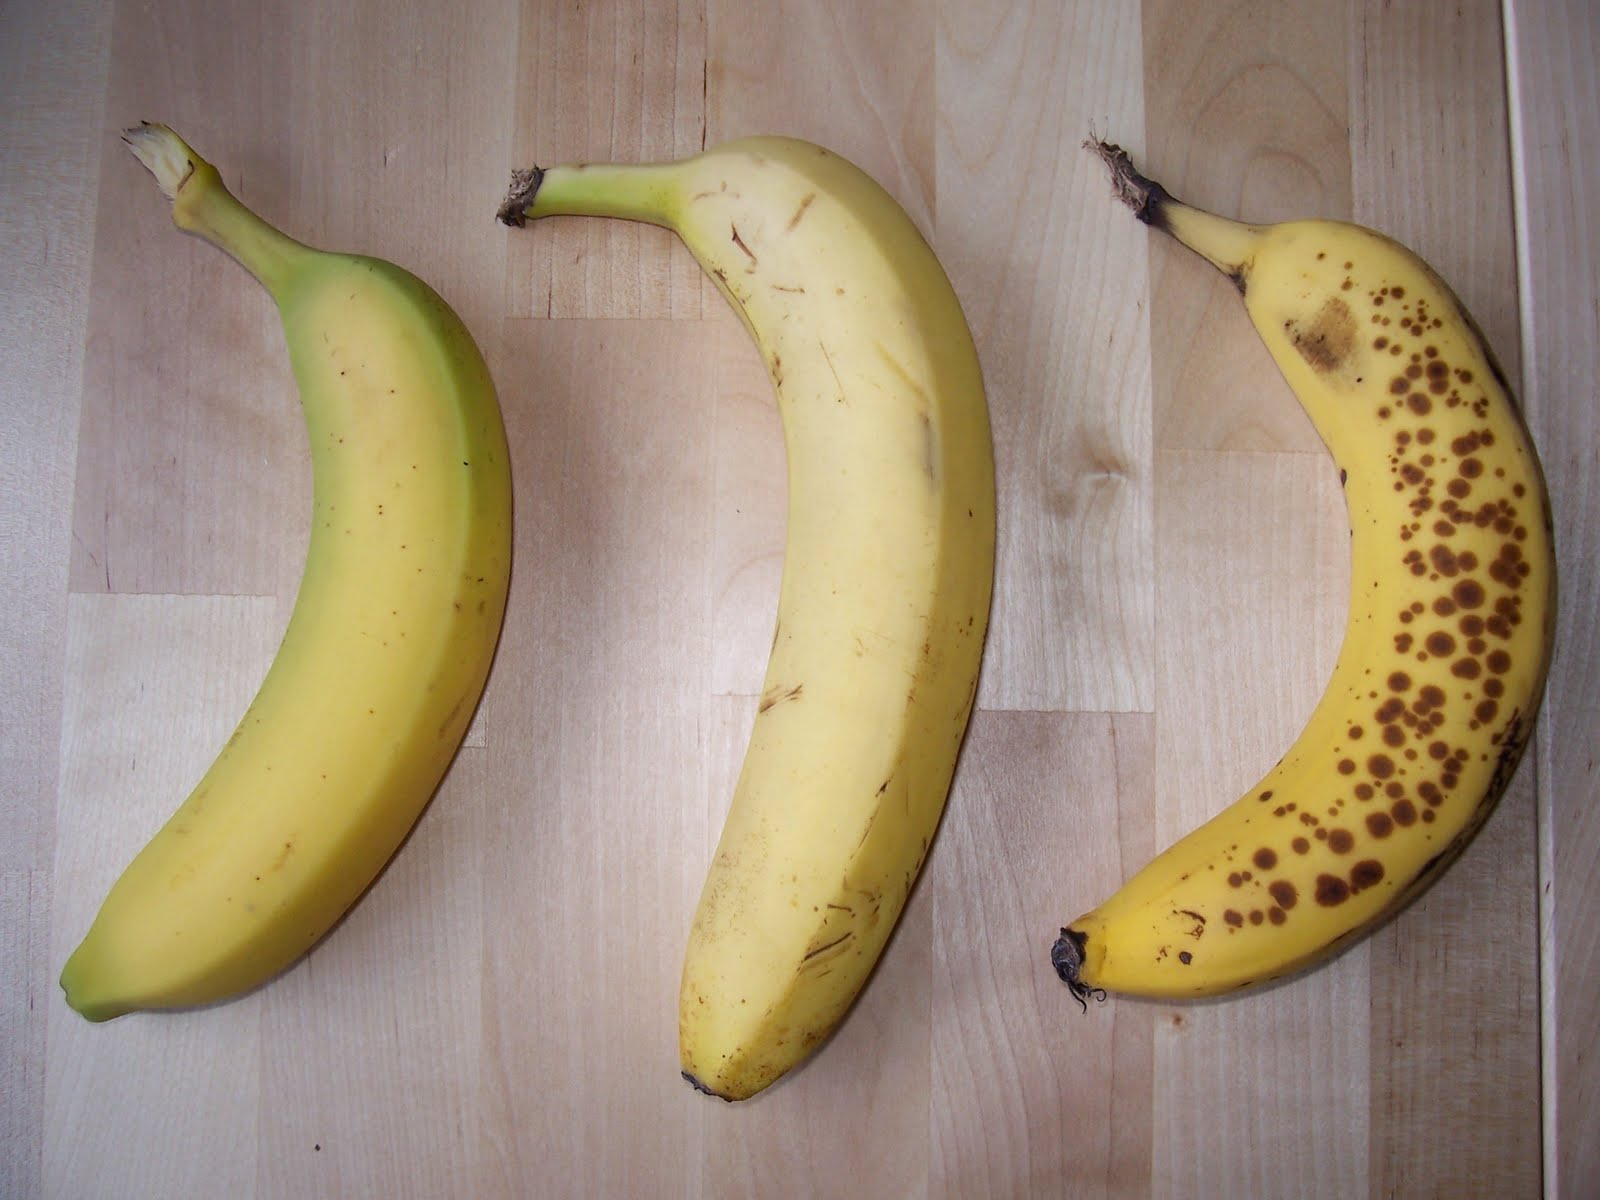 helen 39 s road to wellville eine banana ist eine banane a banana is a banana. Black Bedroom Furniture Sets. Home Design Ideas